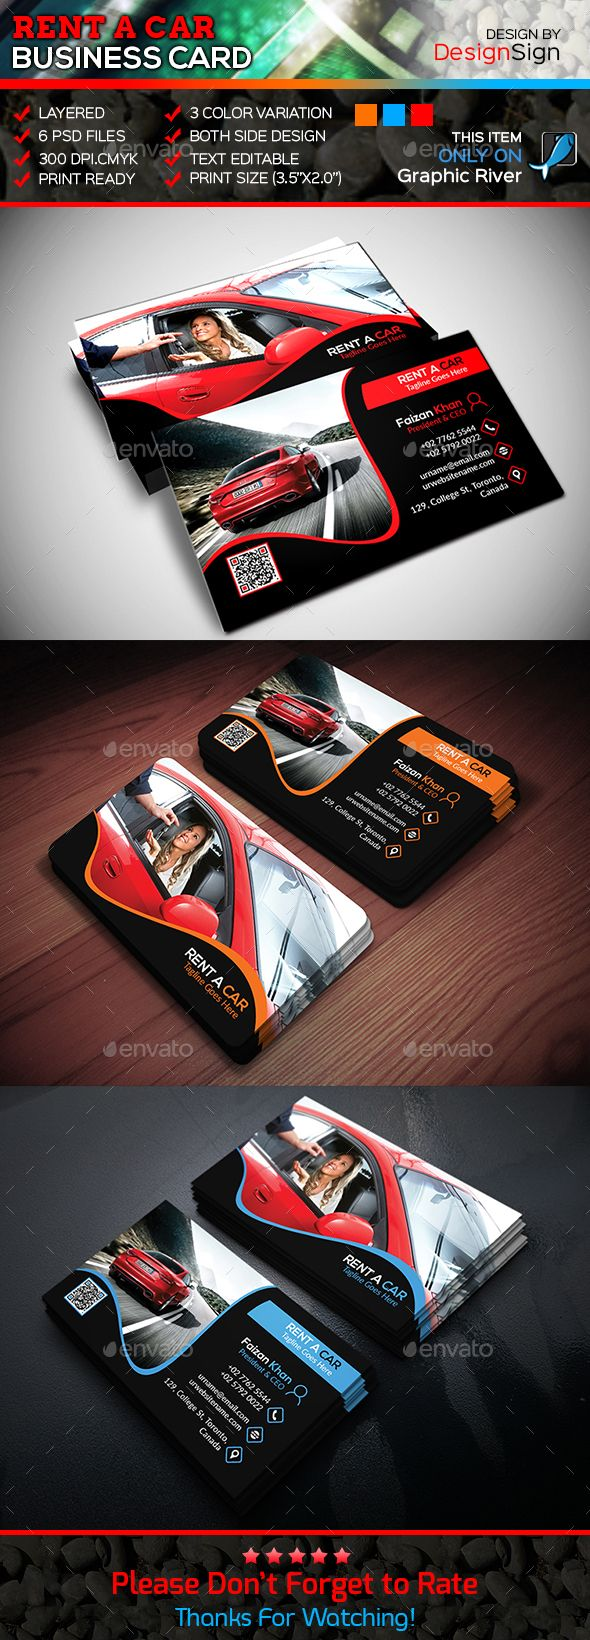 Rent A Car Business Card Template PSD #design Download: http://graphicriver.net/item/rent-a-car-business-card/13920233?ref=ksioks